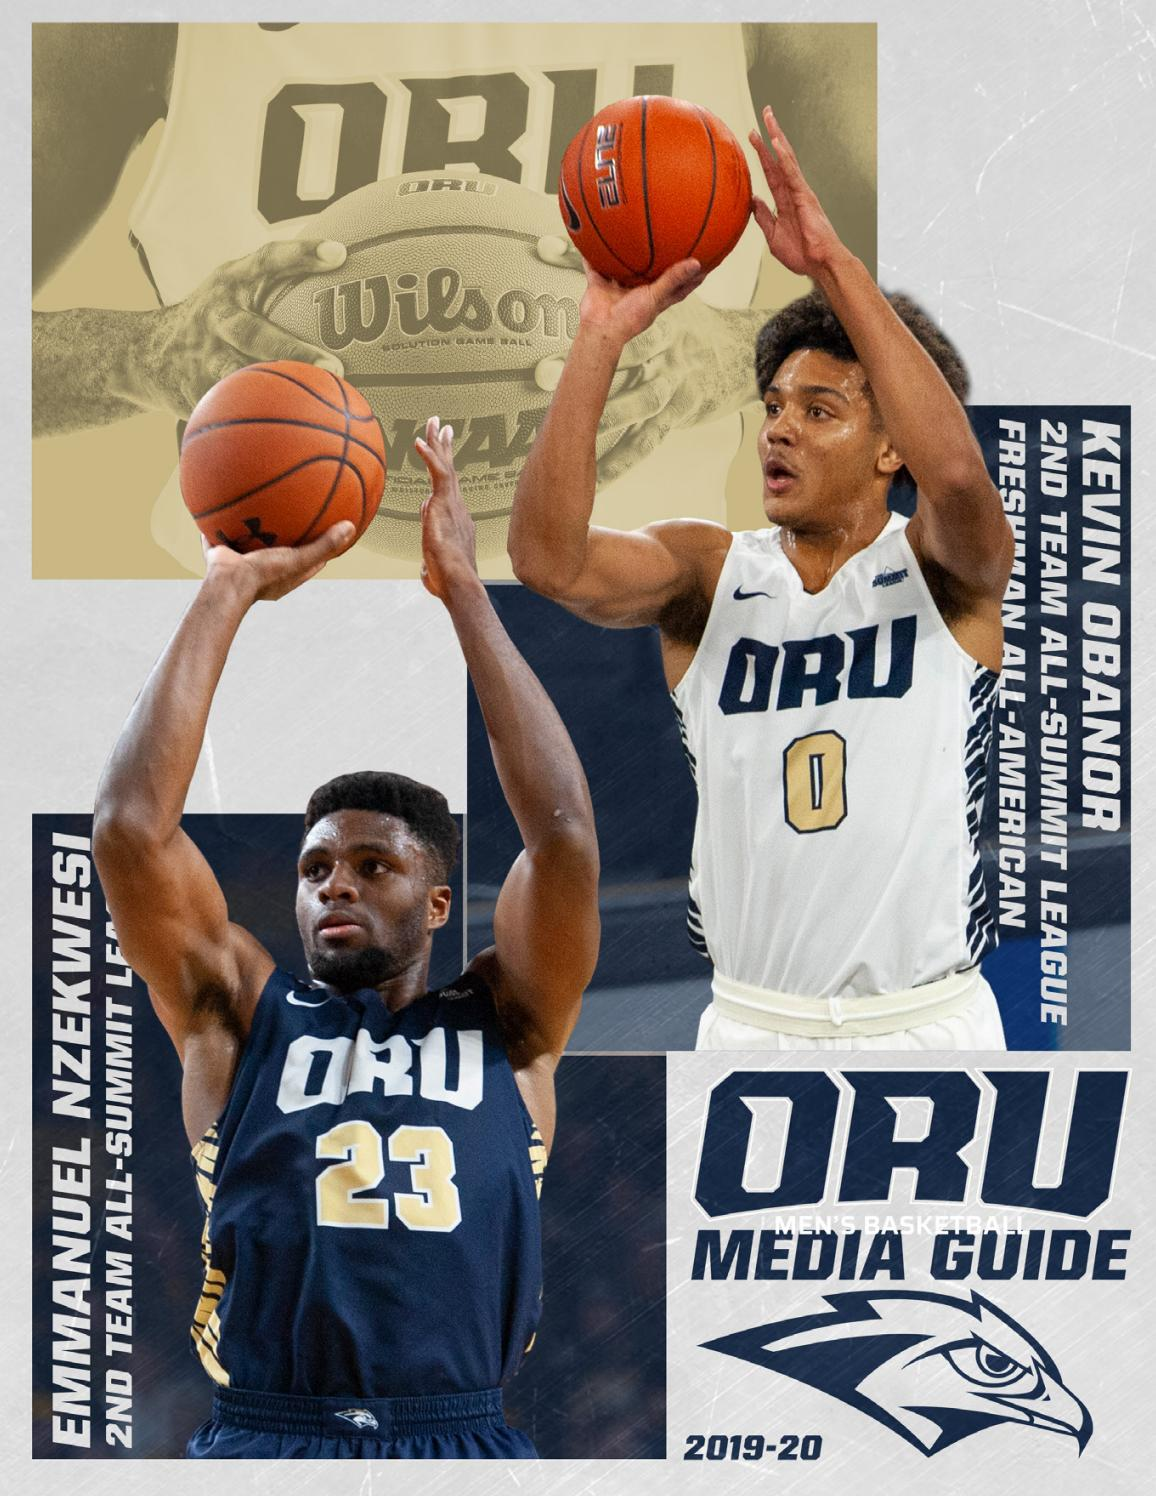 2019-20 ORU Men's Basketball Media Guide by ORU Athletics - issuu